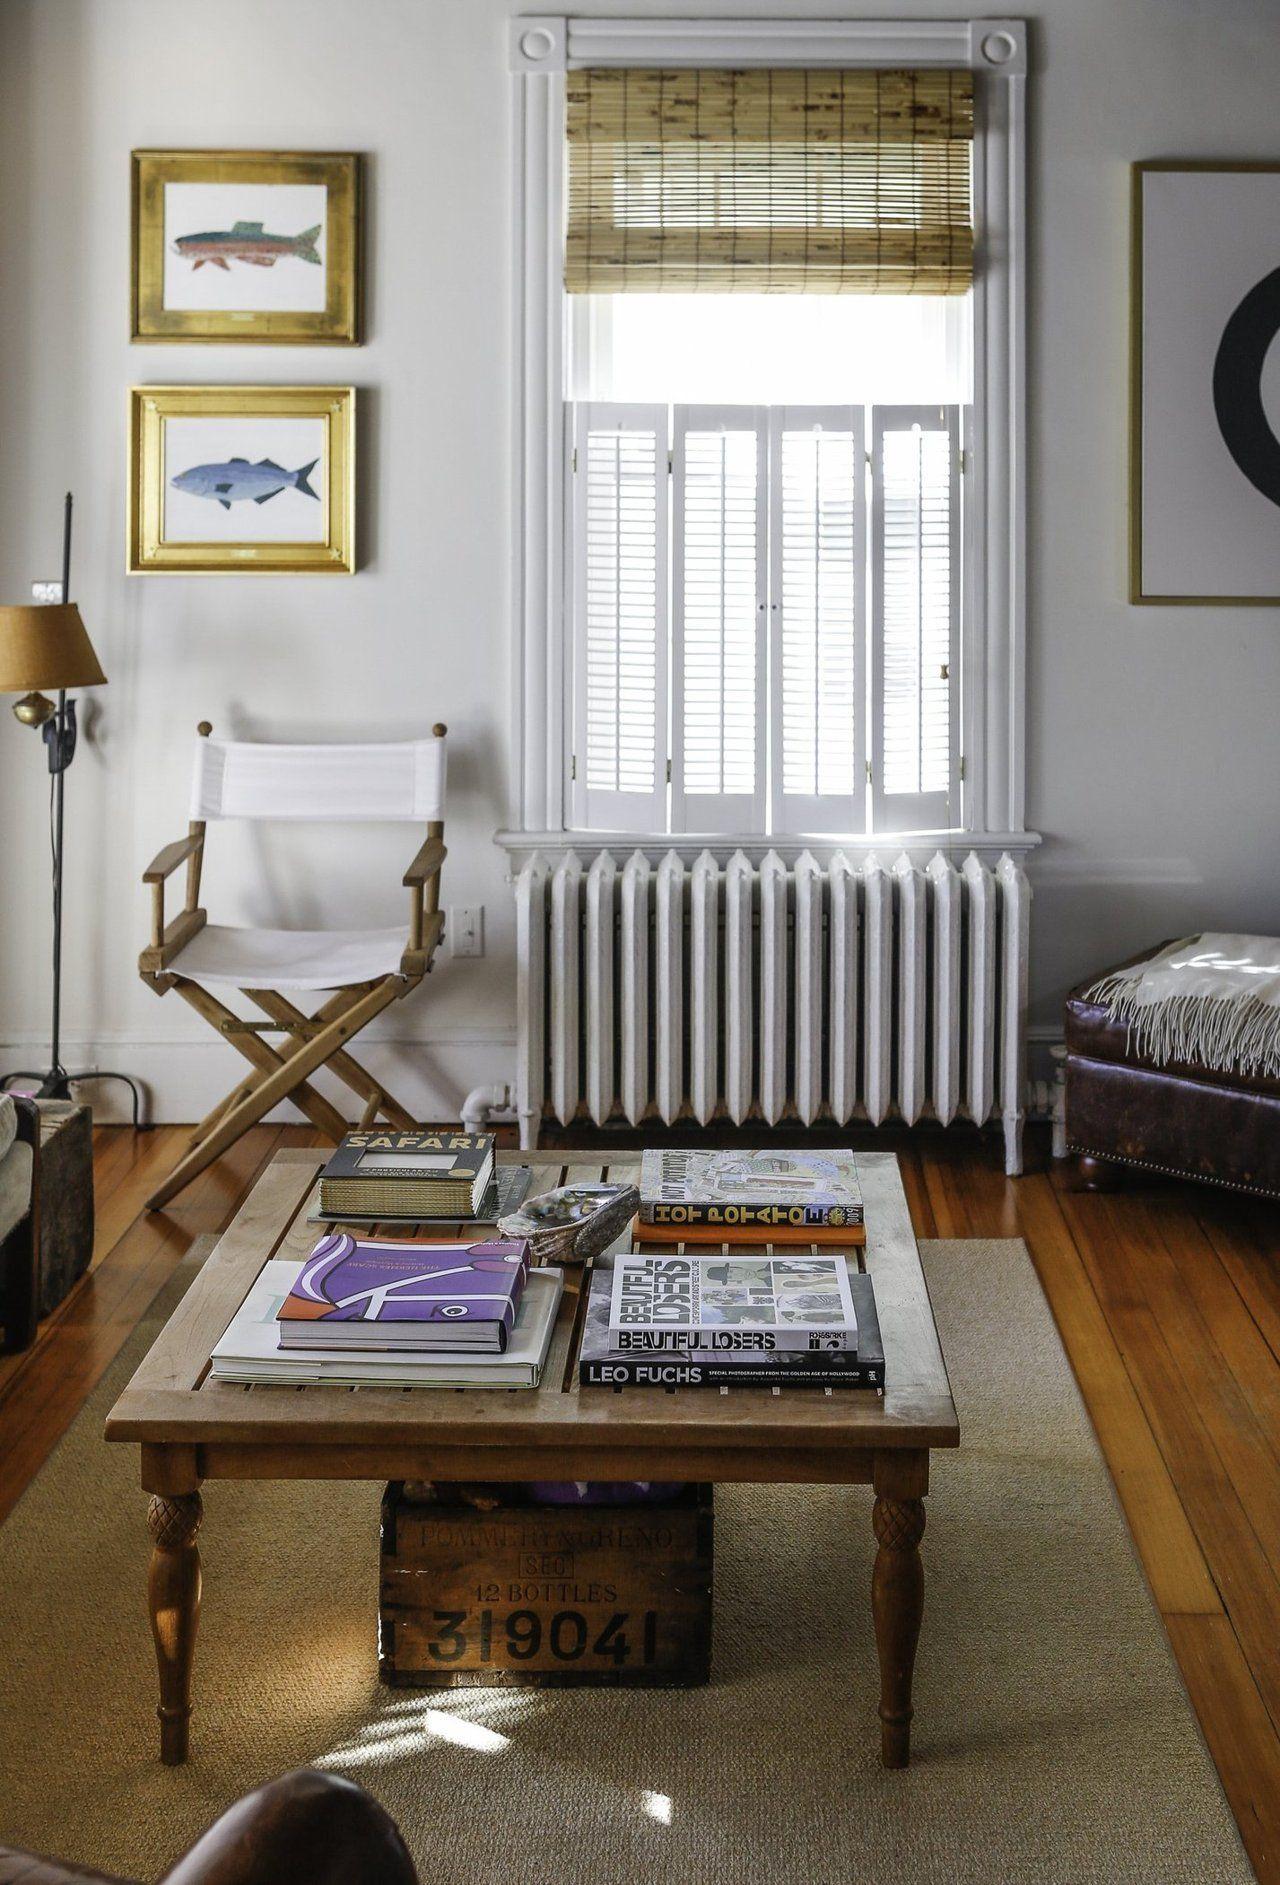 Outside window treatment ideas  miles u antenaus laid back coastal home  interiors window and lights